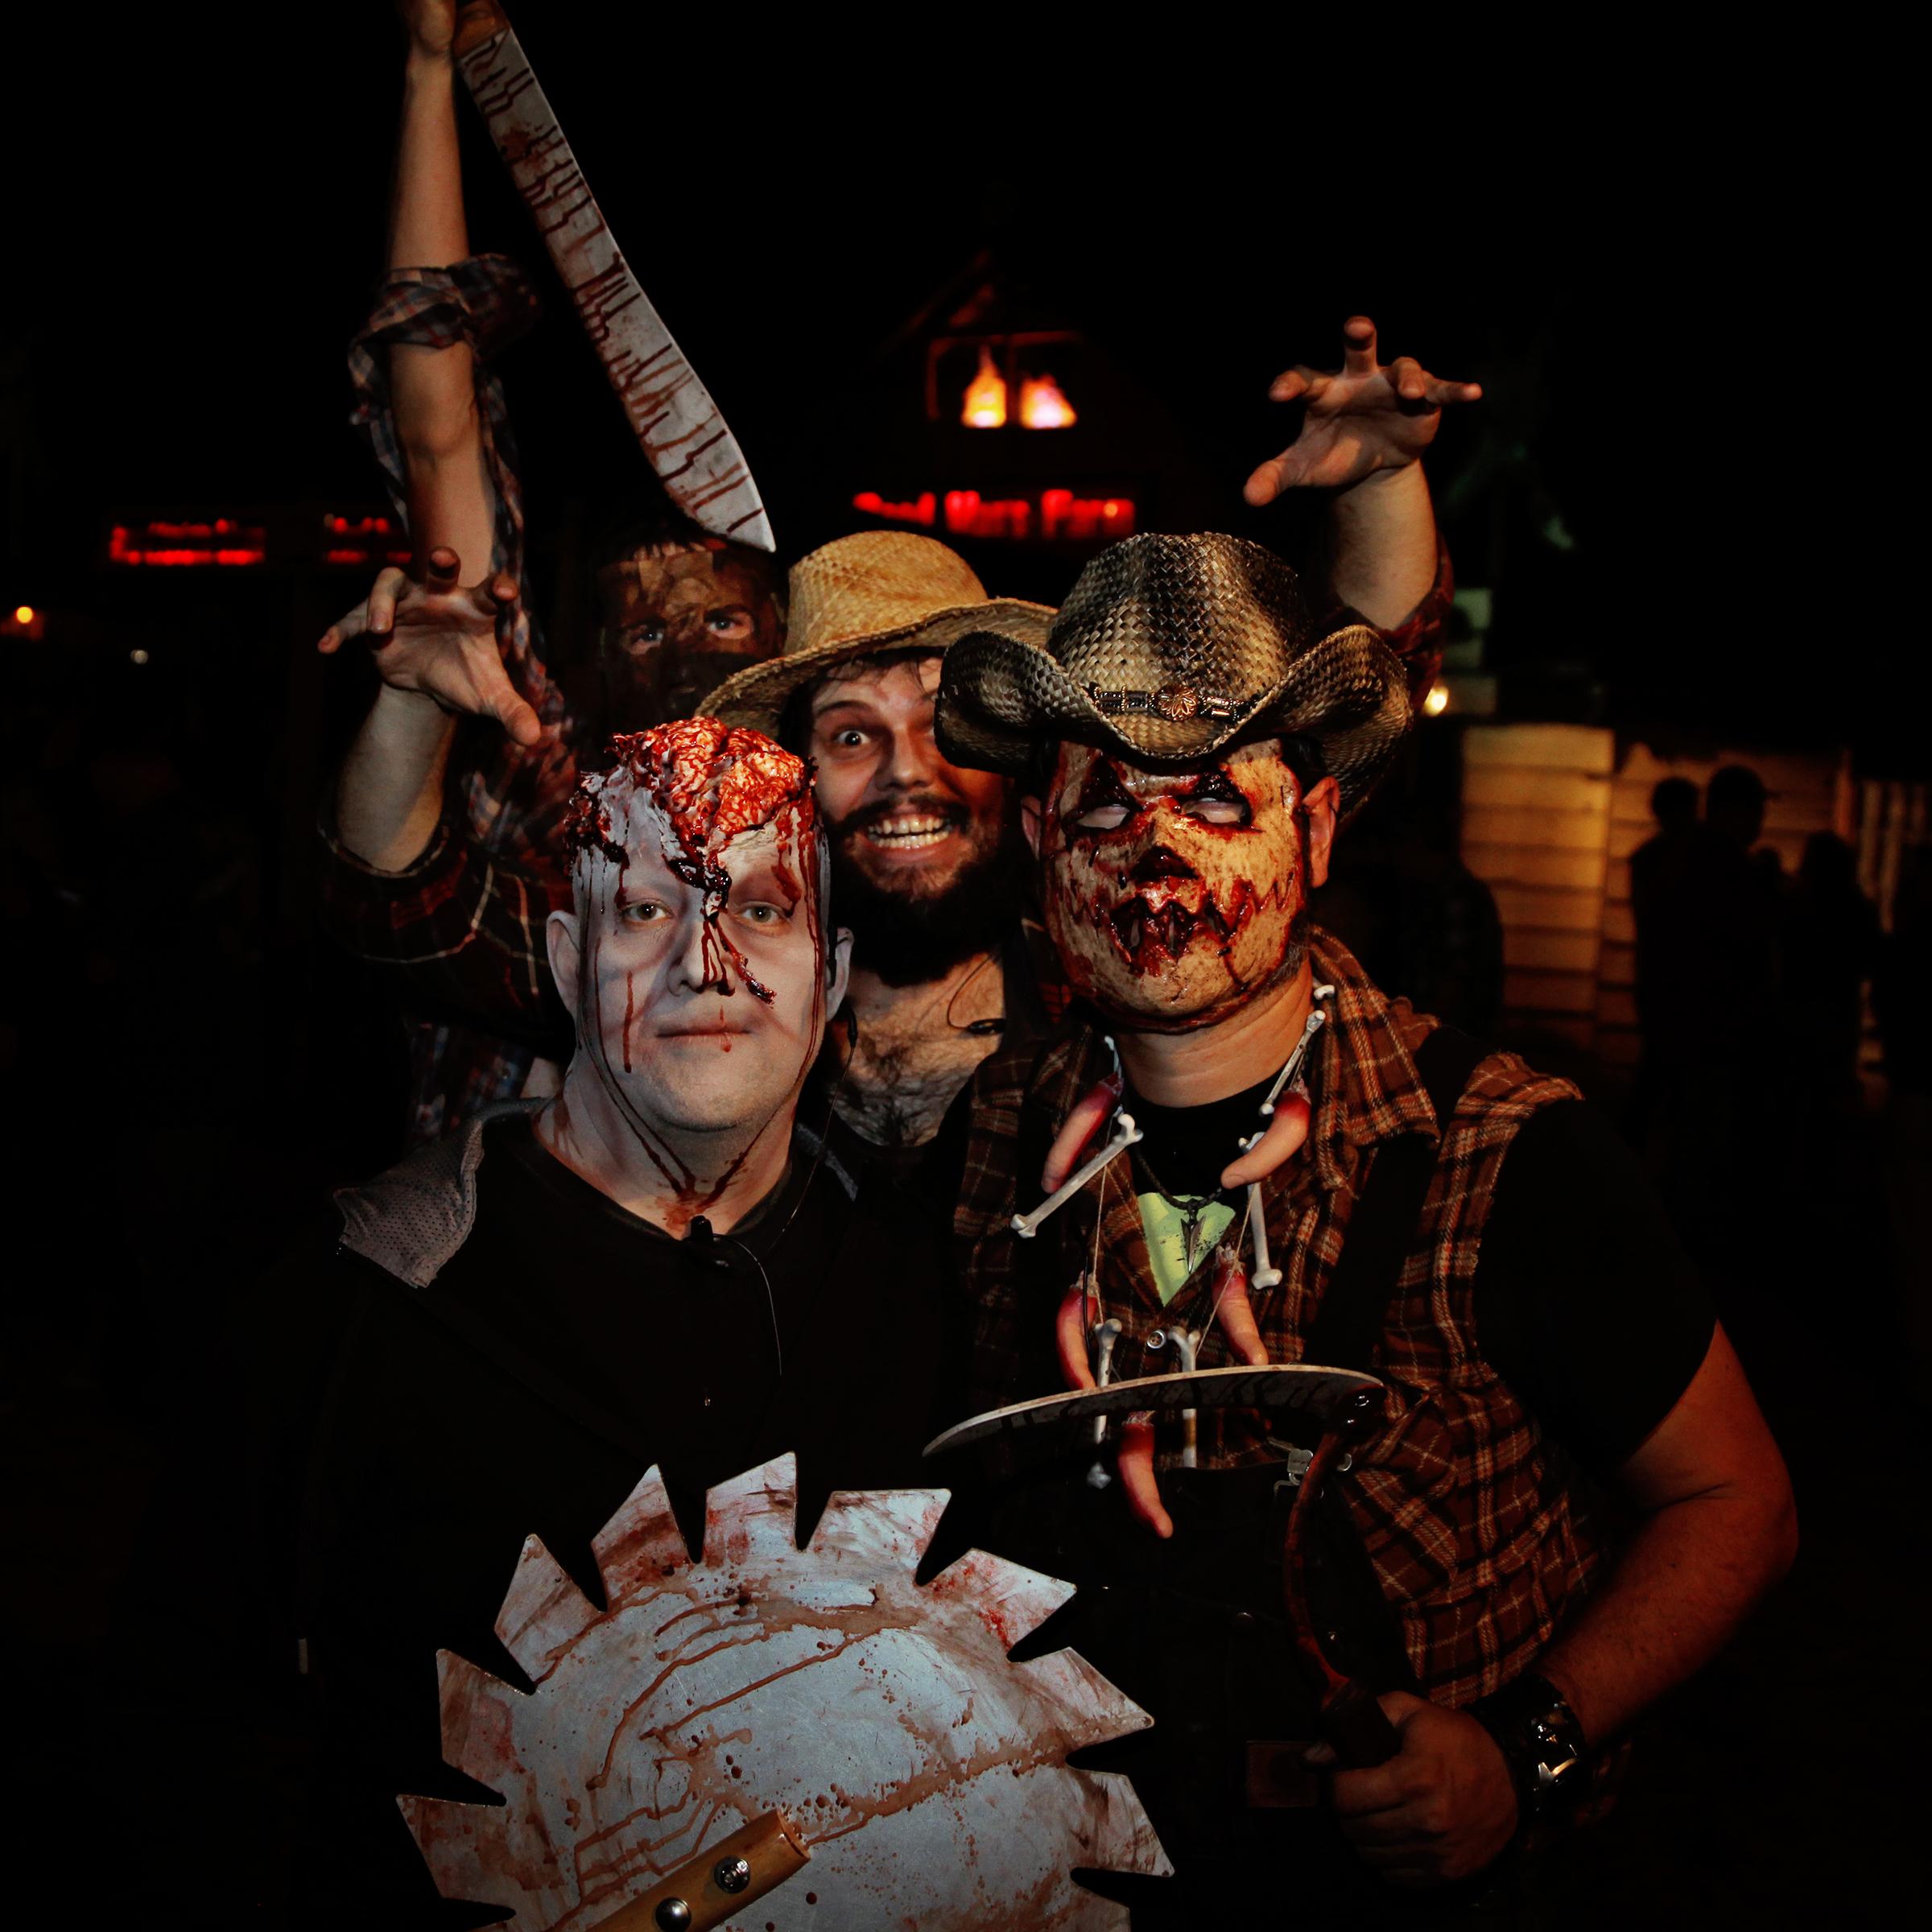 haunted actors from Dead Man's Farm in London County TN